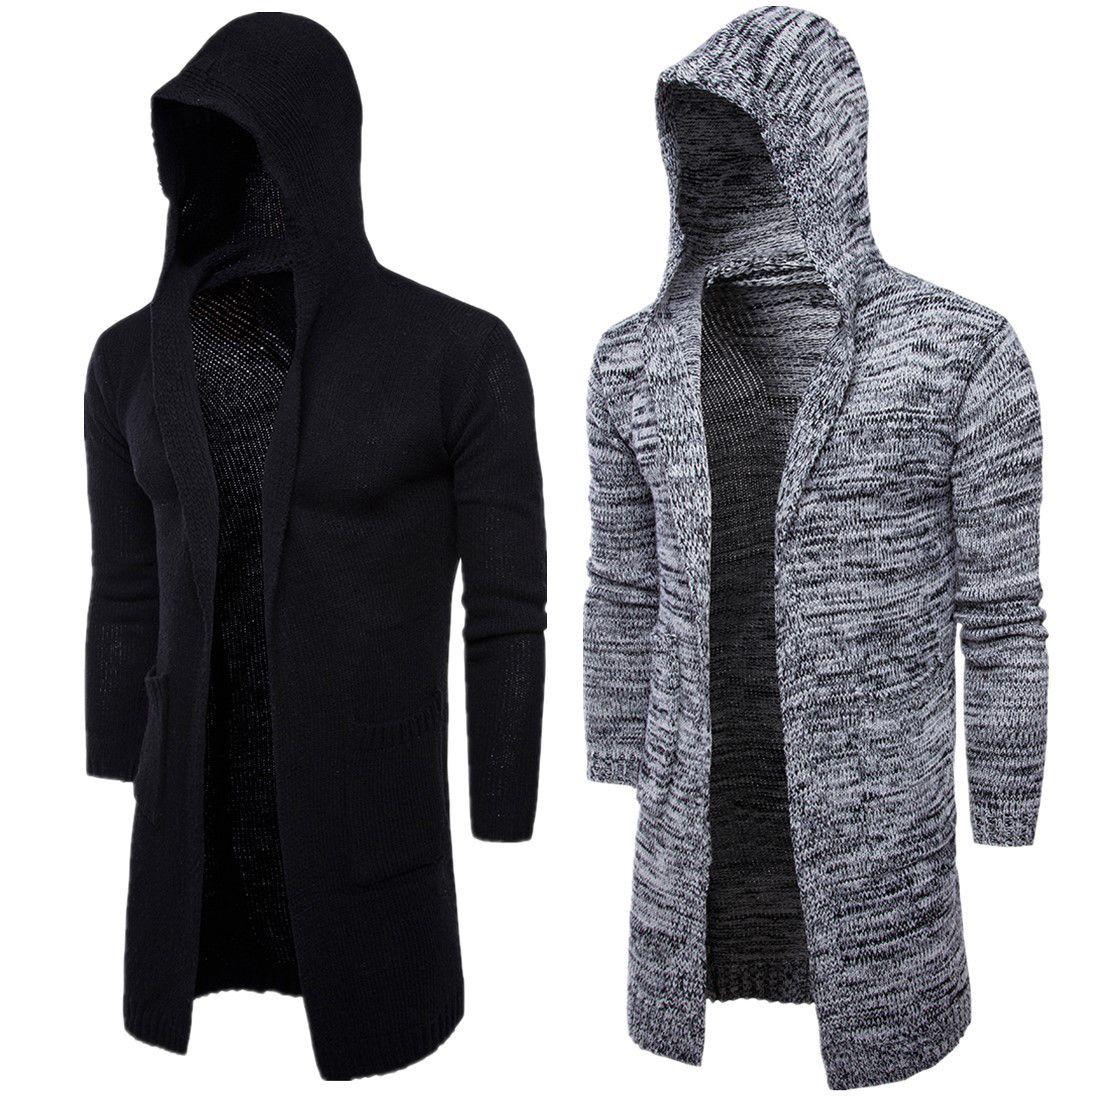 Me hooded near cardigan sweaters for men walmart rotorua